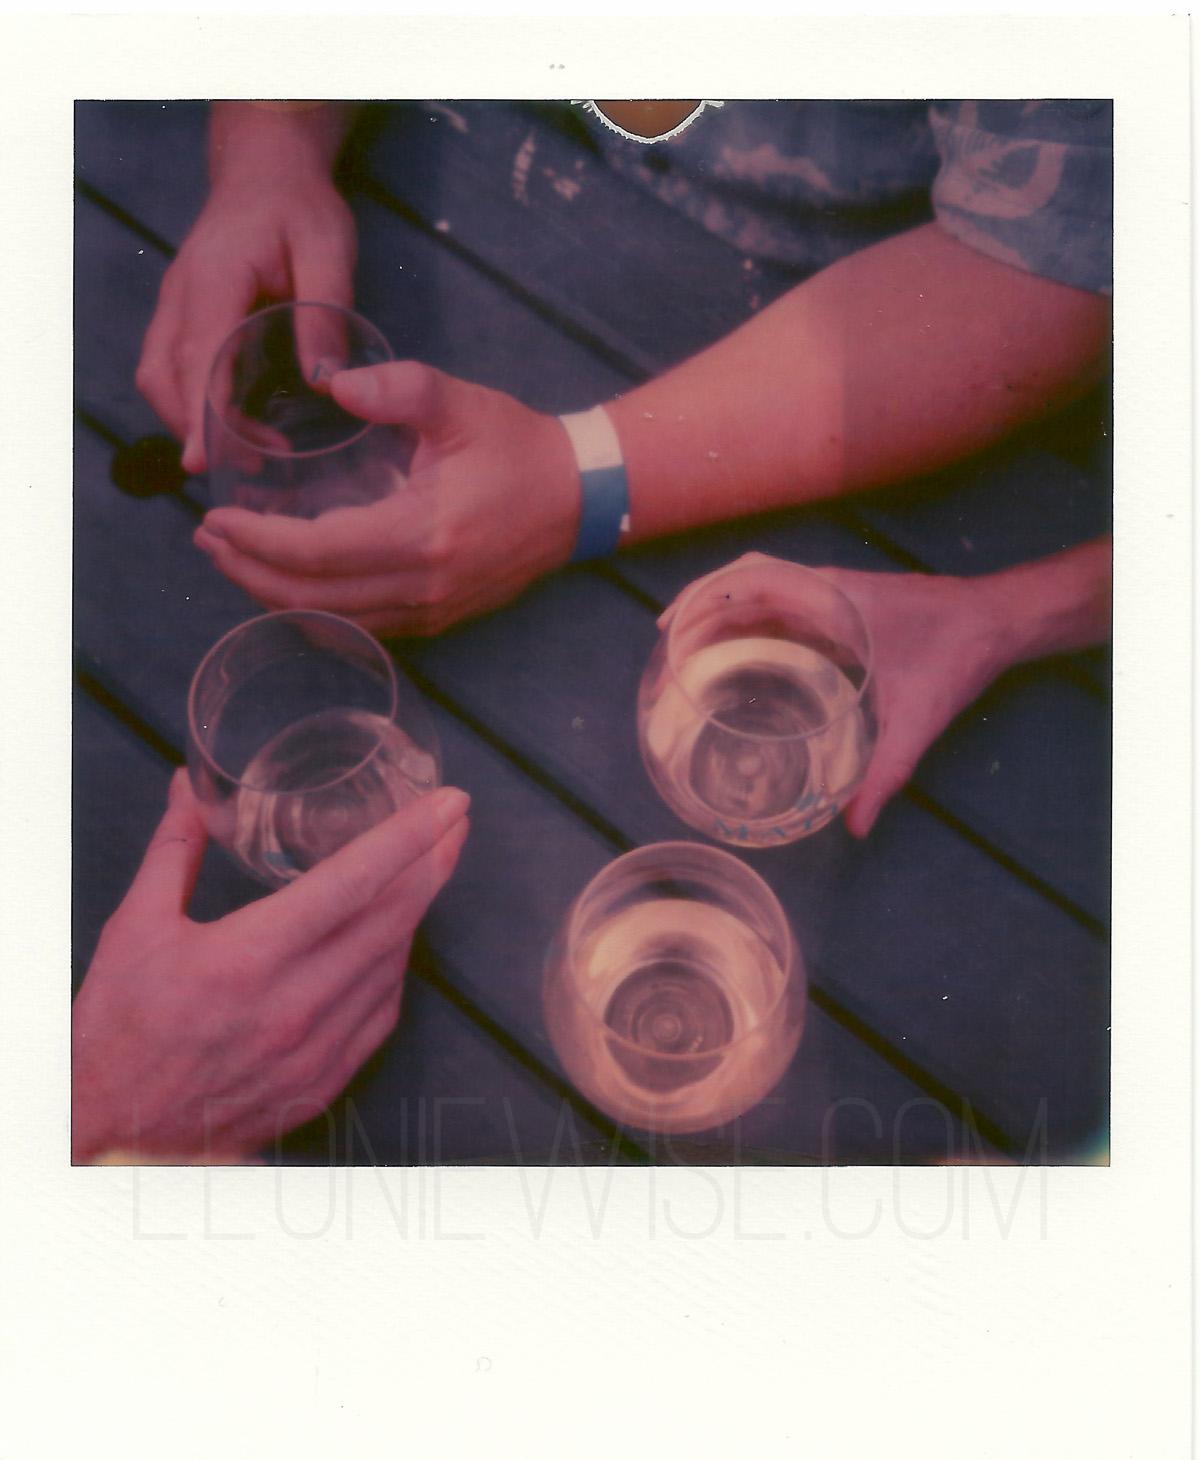 MusicAtMatua_Polaroid-SX70_Impossible-PX70_leoniewise-6